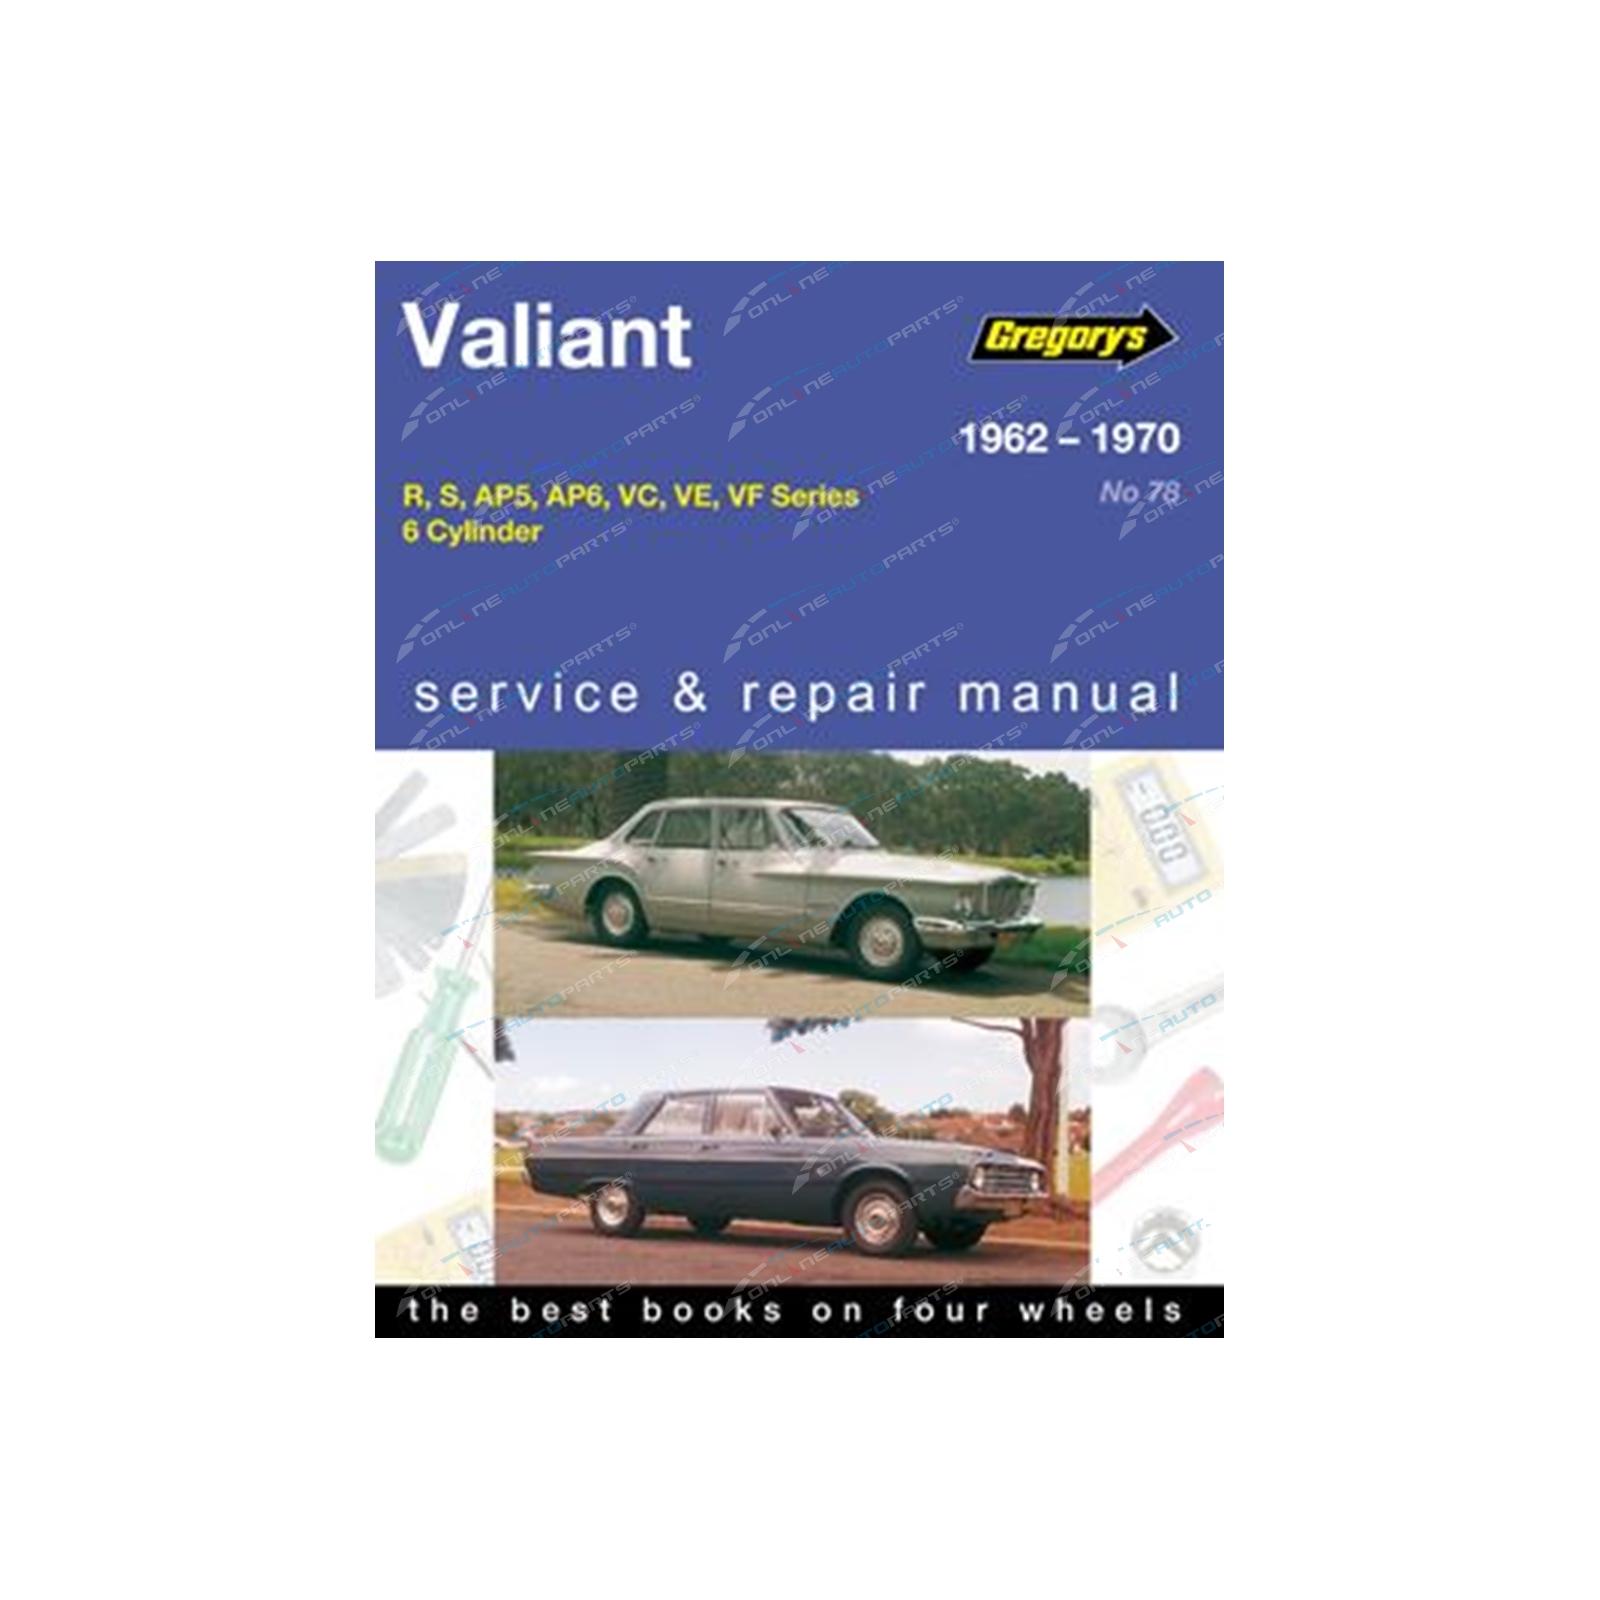 Motors Auto Repair Manual 1970 Free Auto Repair Manuals 2019 01 17